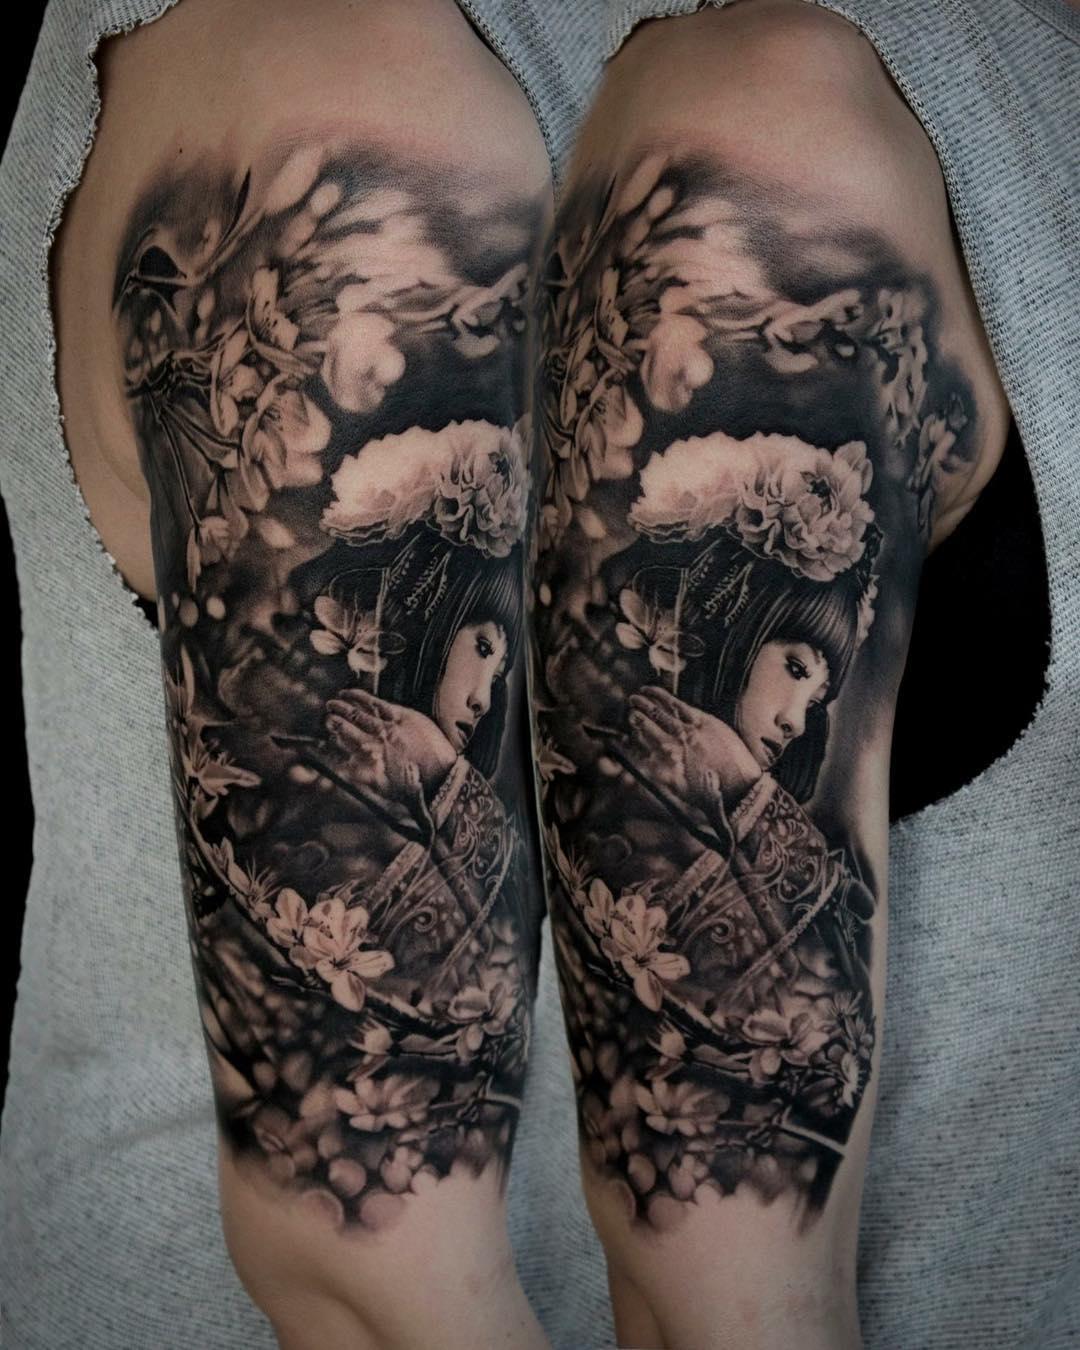 bacanu-bogdan-tatoueur-corsair-tattoo-ink-convention-tatouage-bretagne (7)